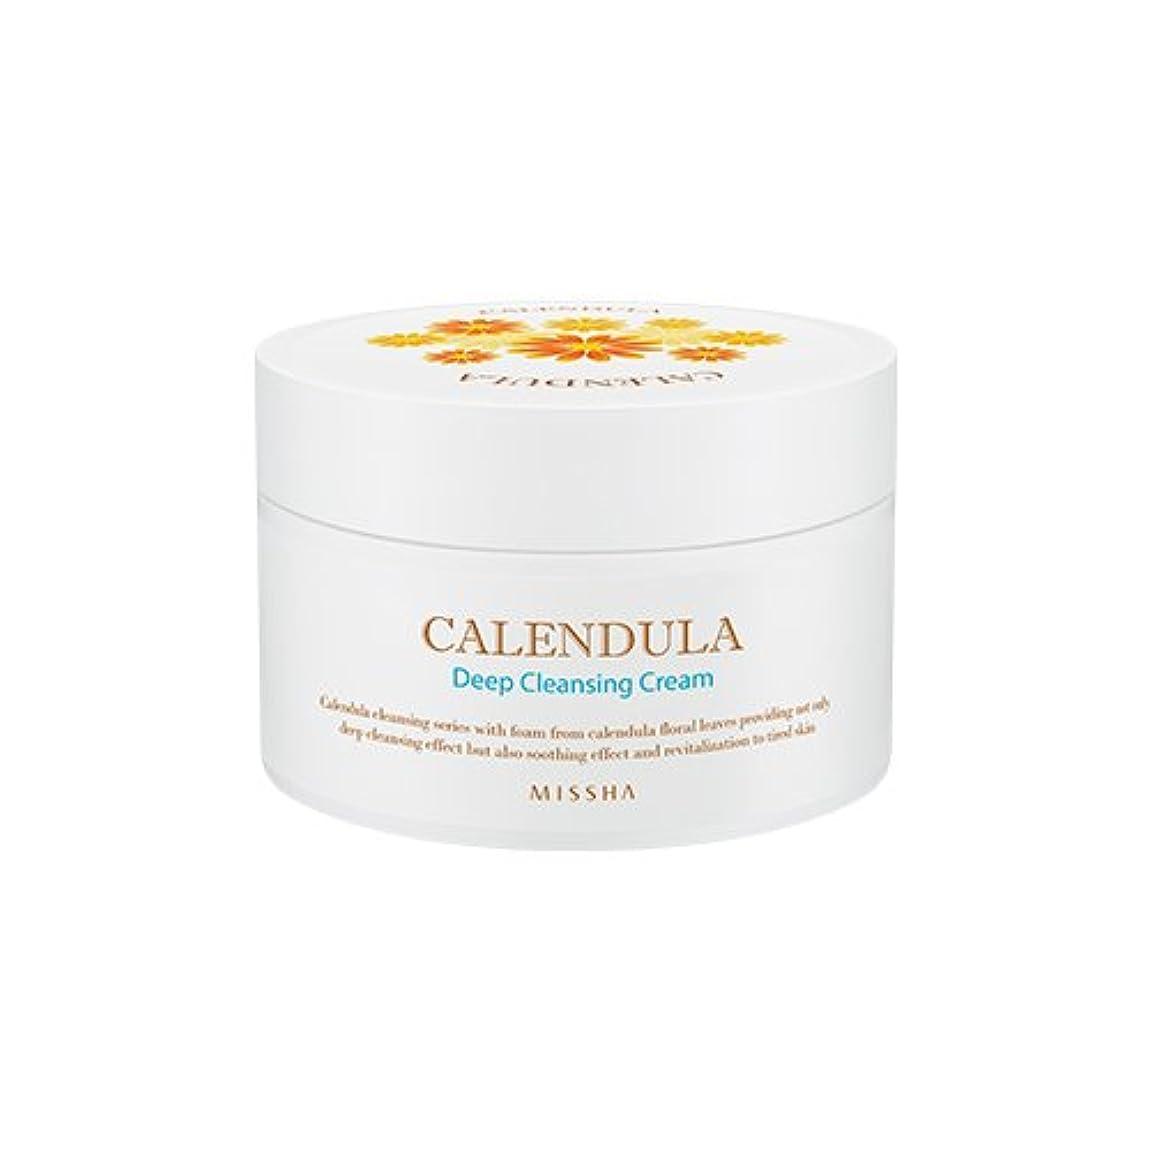 MISSHA Calendula Deep Cleansing Cream 200ml/ミシャ カレンデュラ ディープクレンジング クリーム 200ml